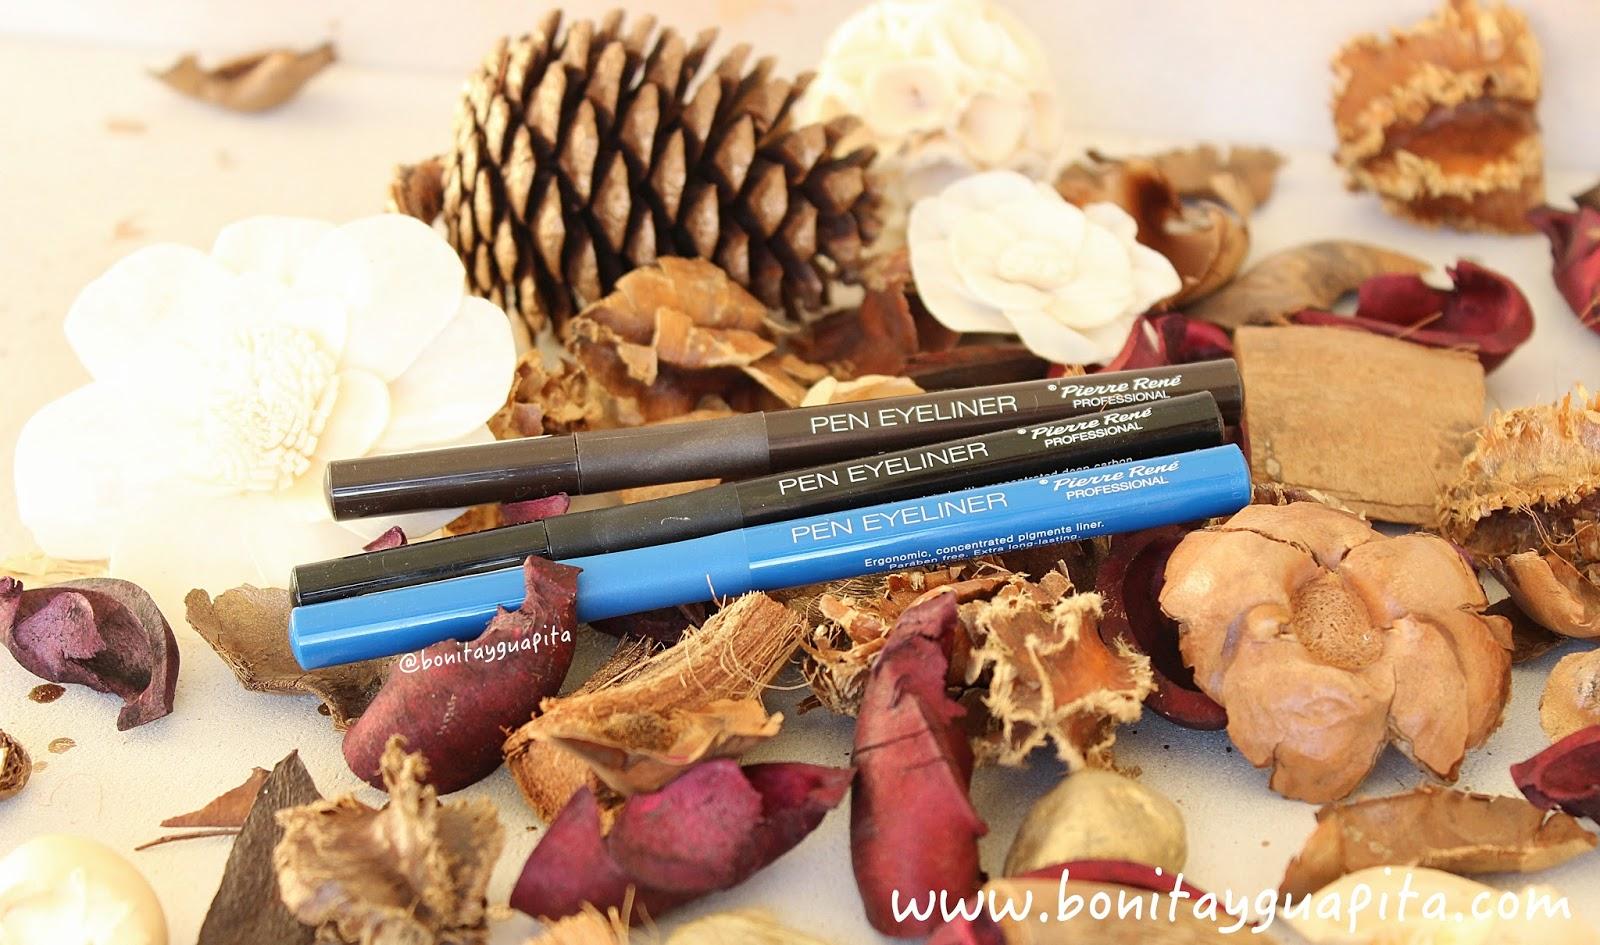 pen eyeliner pierre rene delineador rotulador